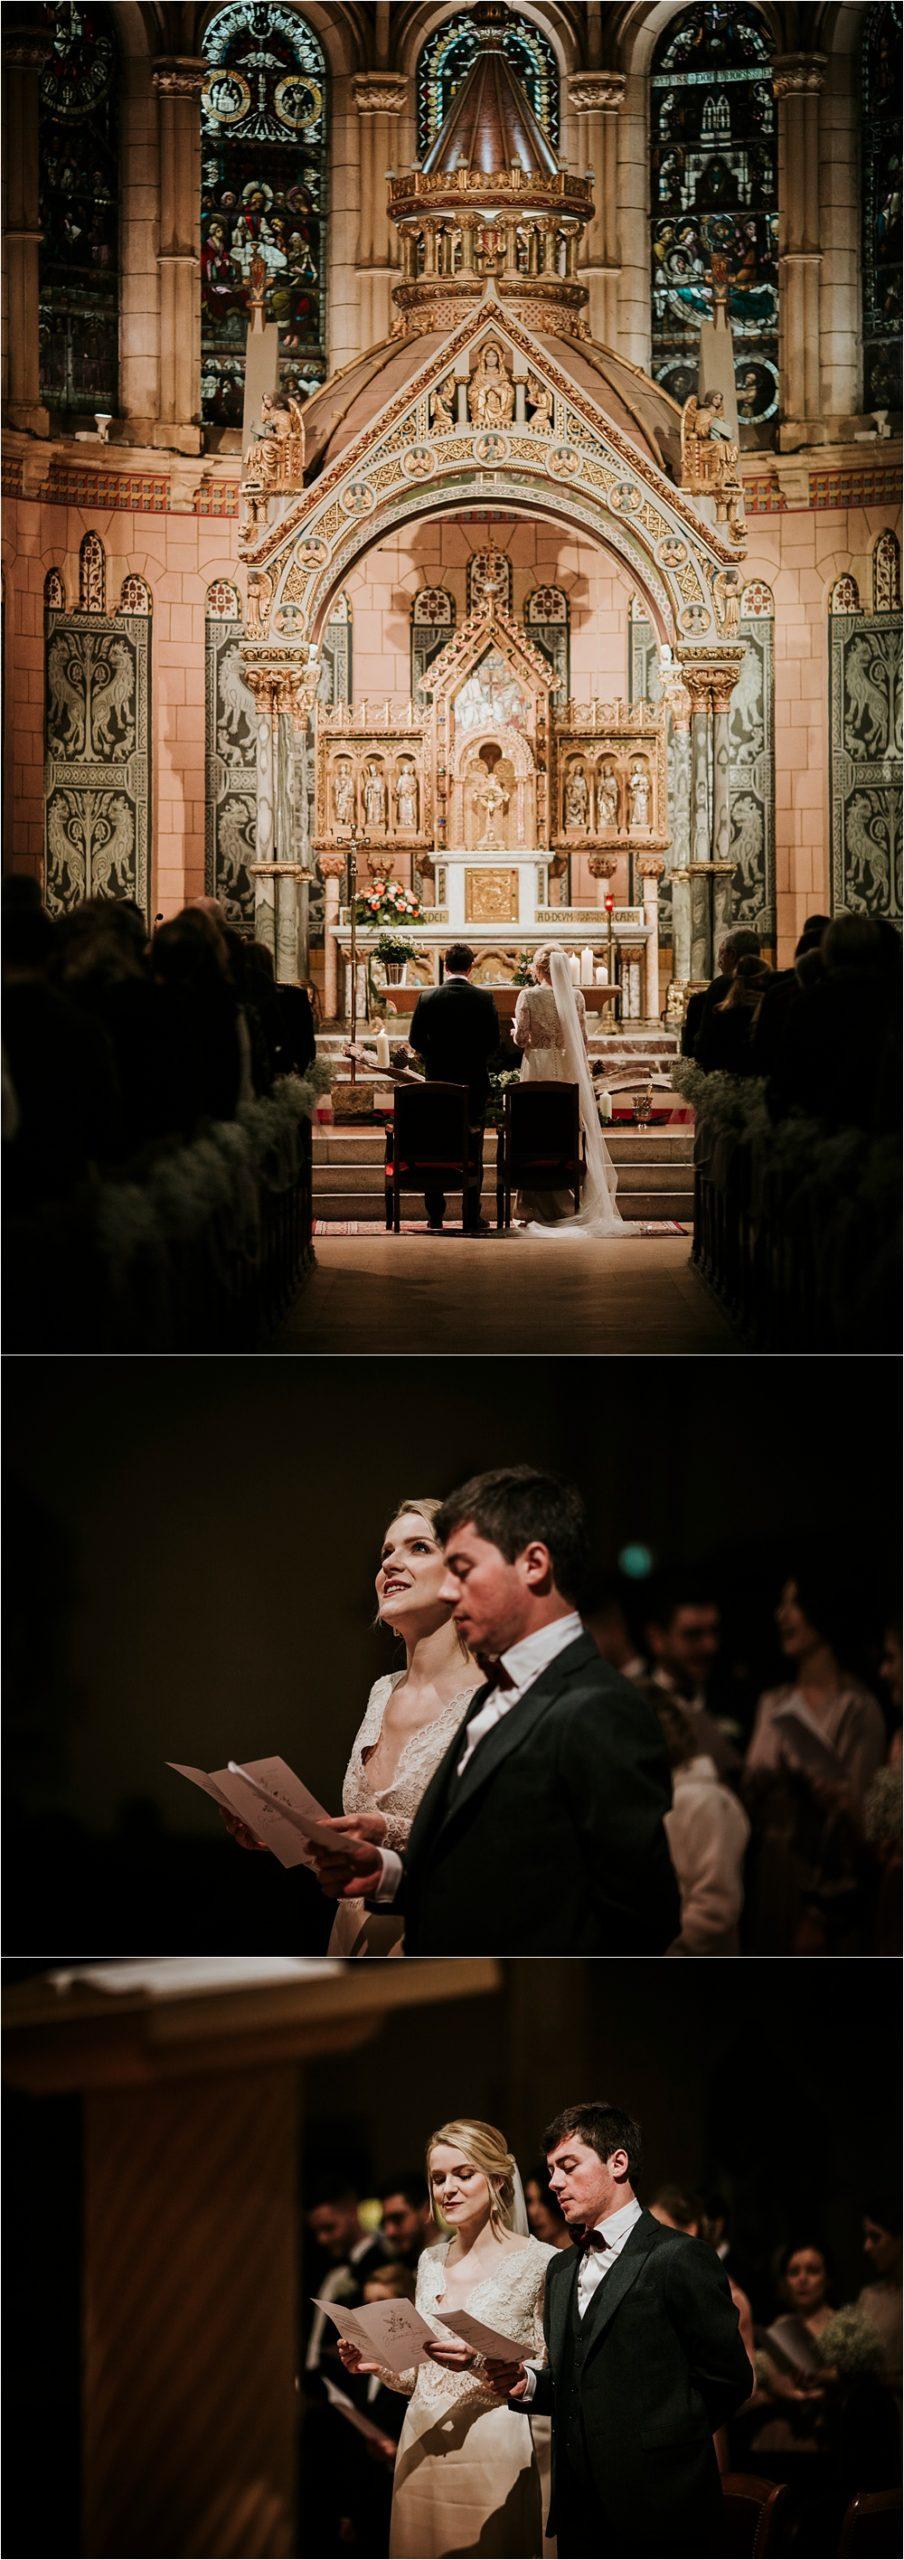 Mariage hiver à Metz en Lorraine